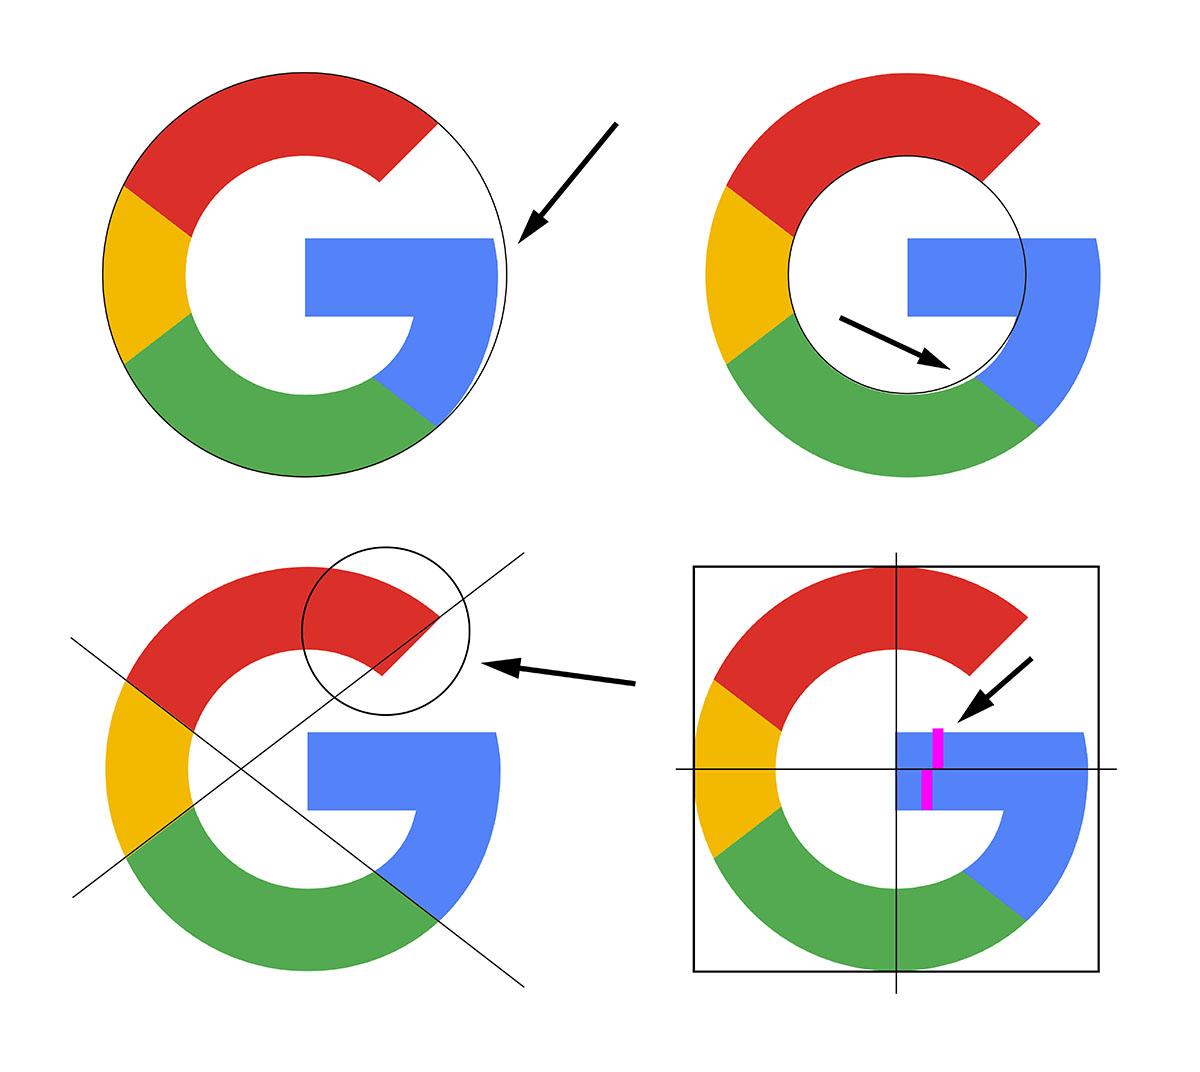 Diseño del logo de Google